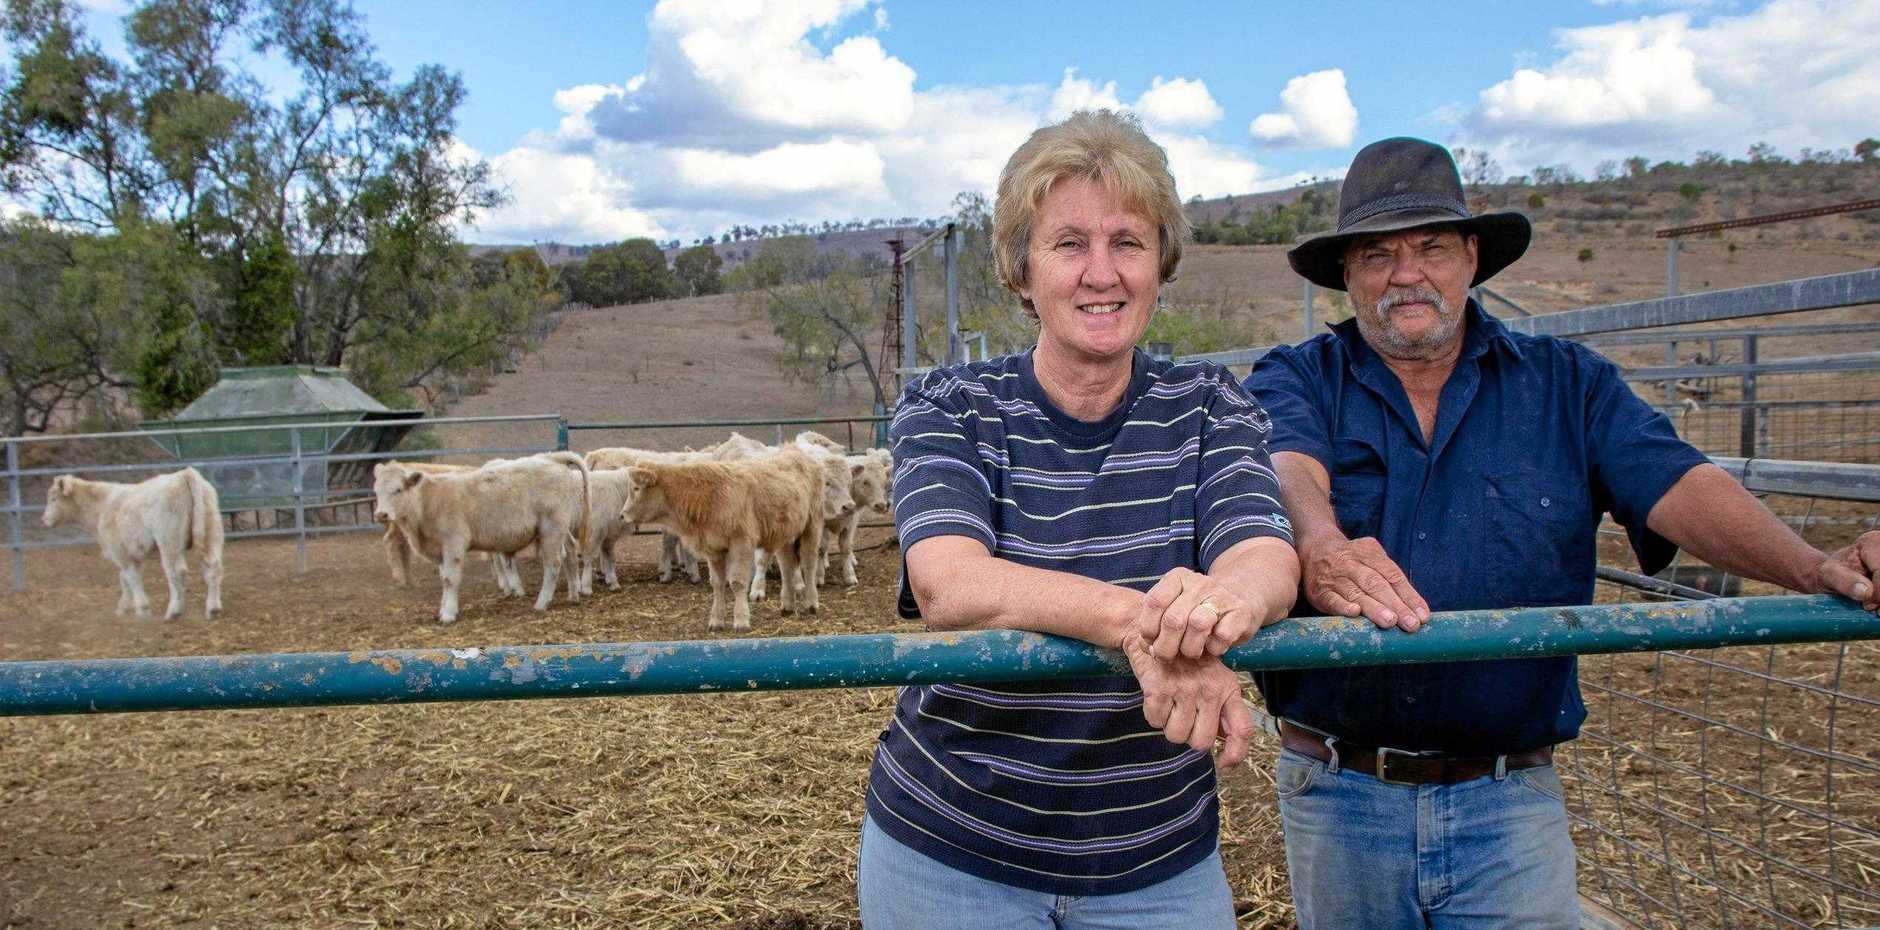 TOP SALE: Blenheim charolais Bull breeders Janice and Jim Spreadborough with next year's bulls.